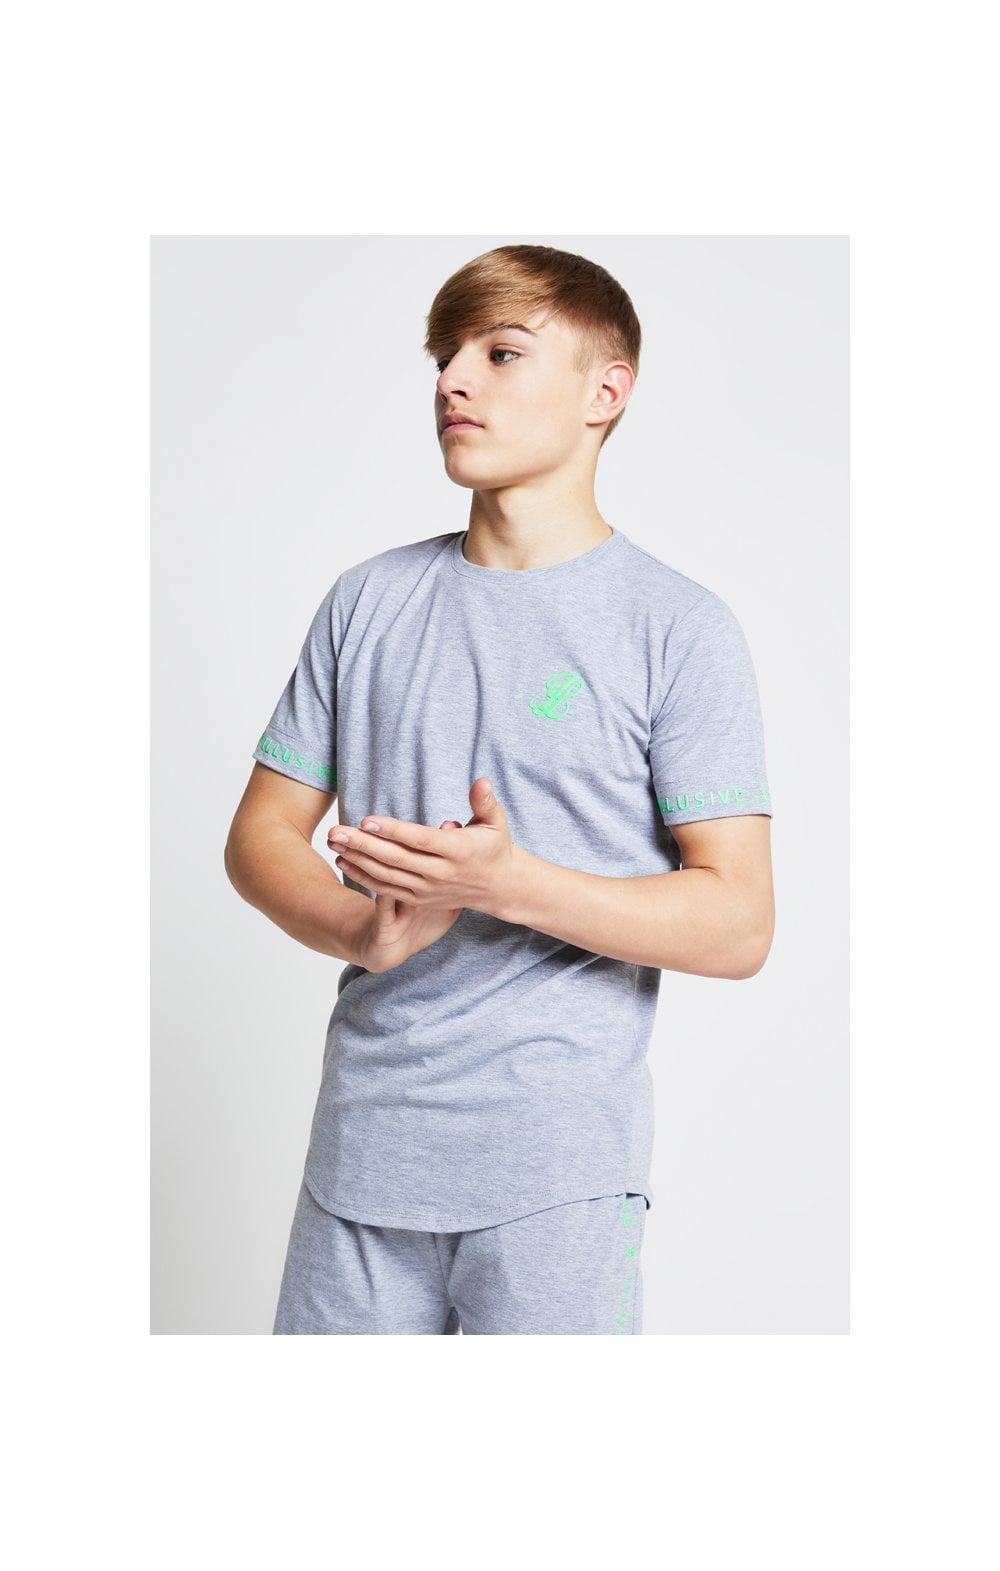 Illusive London Tee  Grey & Neon Green Kids Top Sizes: 15 YRS